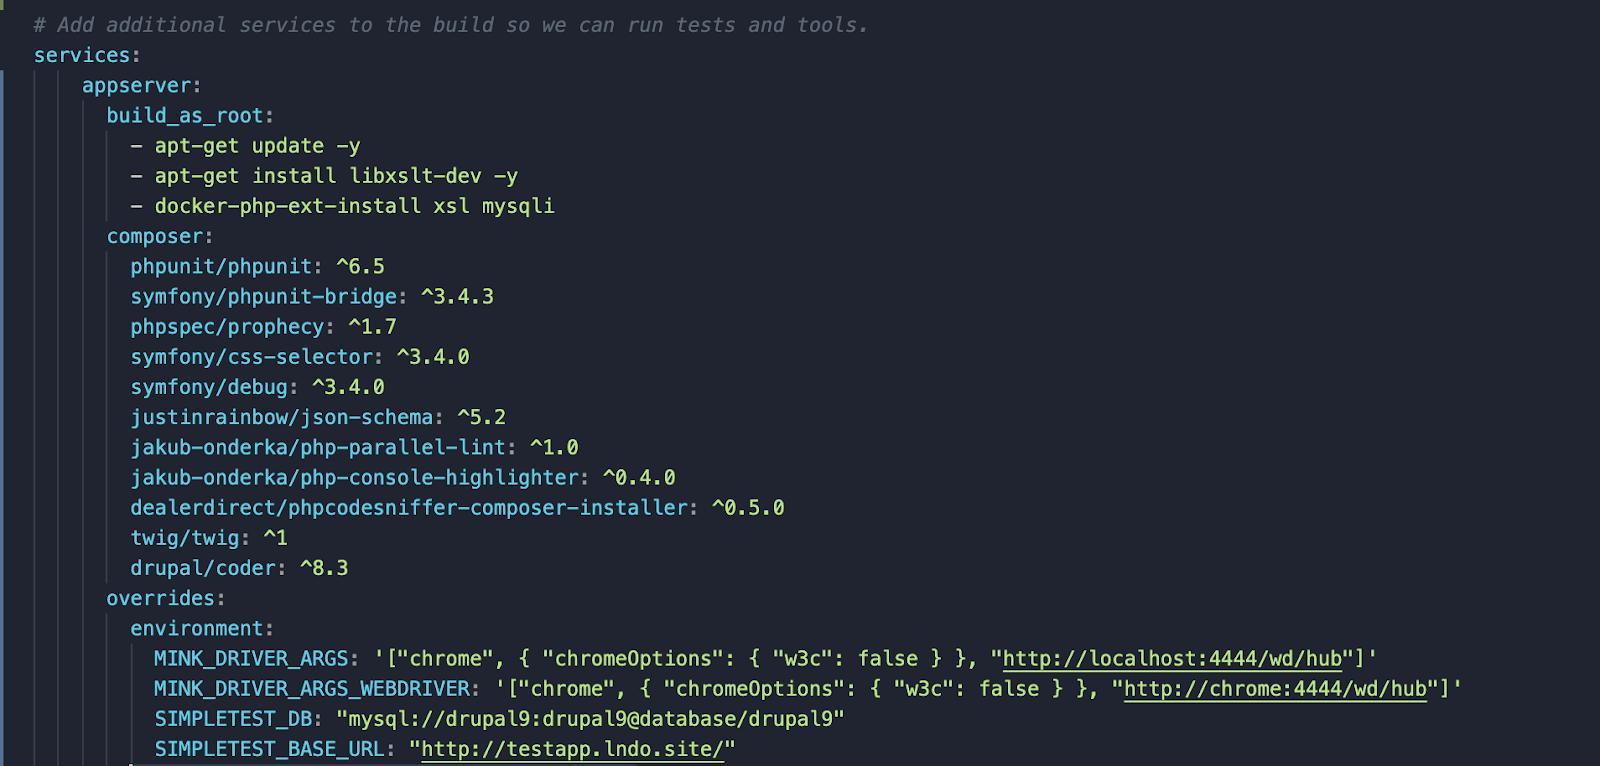 Screenshot of modifying the .lando.yml file.